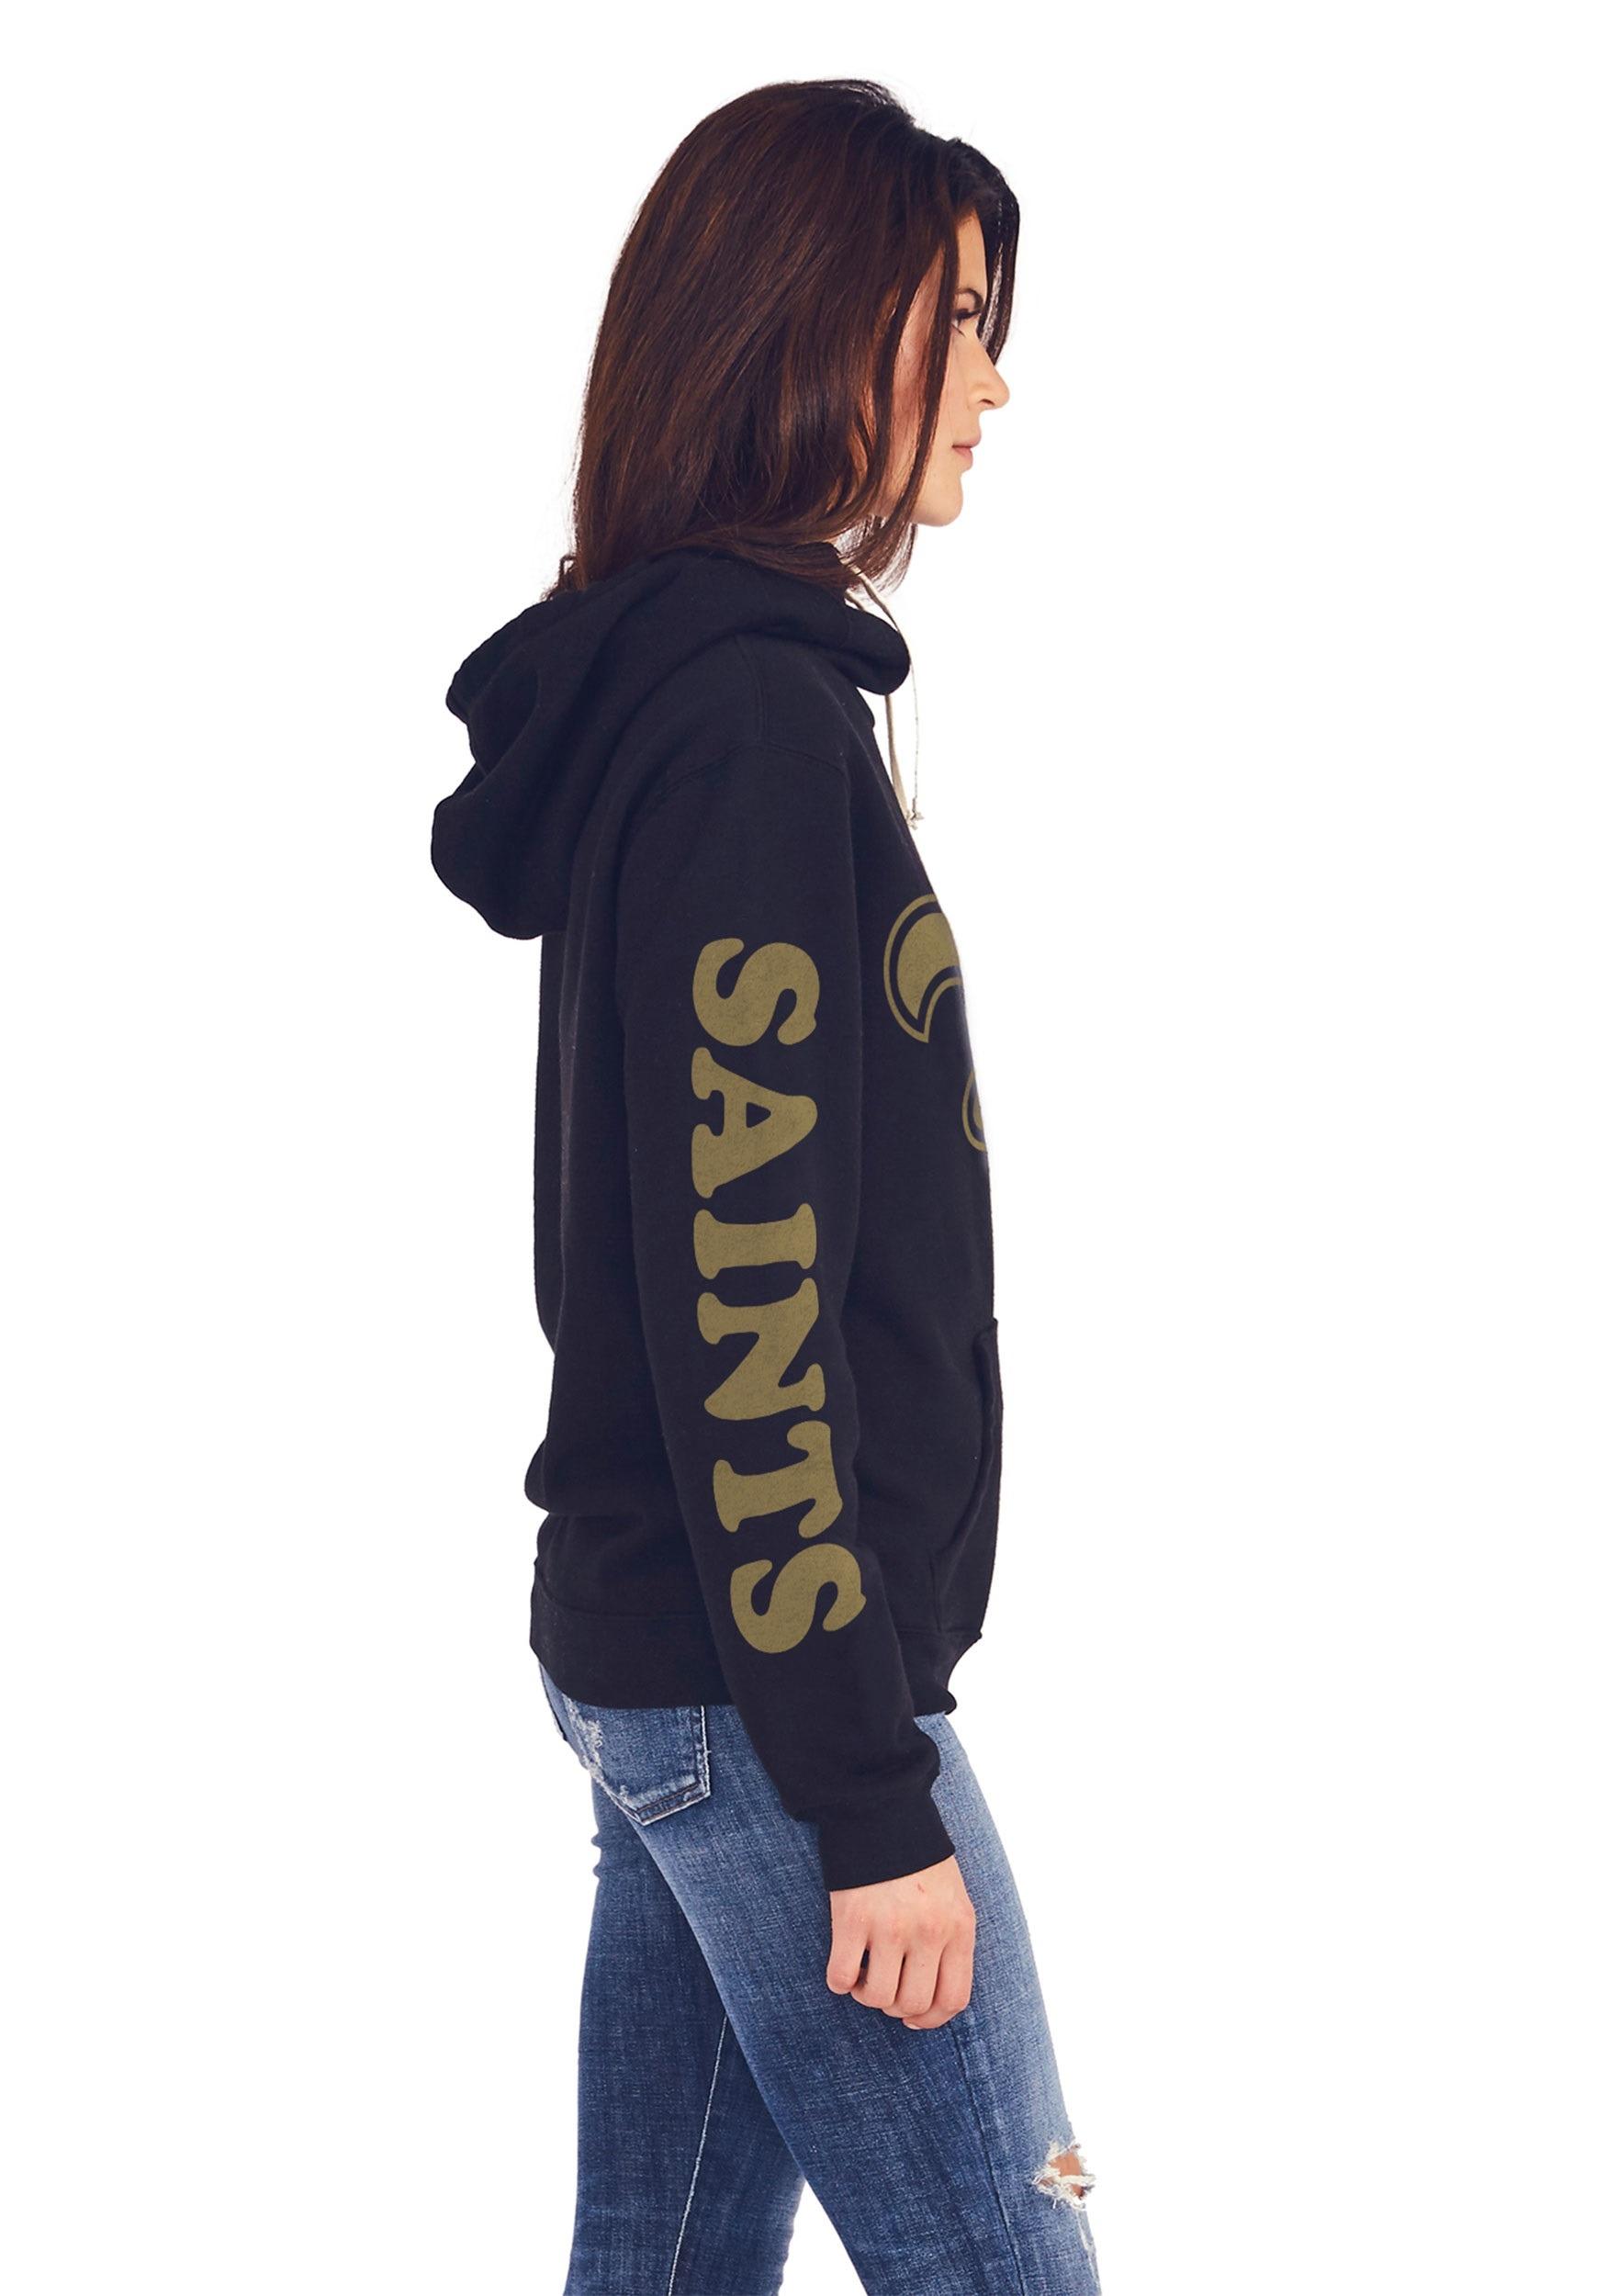 New Orleans Saints Women s Cowl Neck Hooded Sweatshirt 11203dcaf3